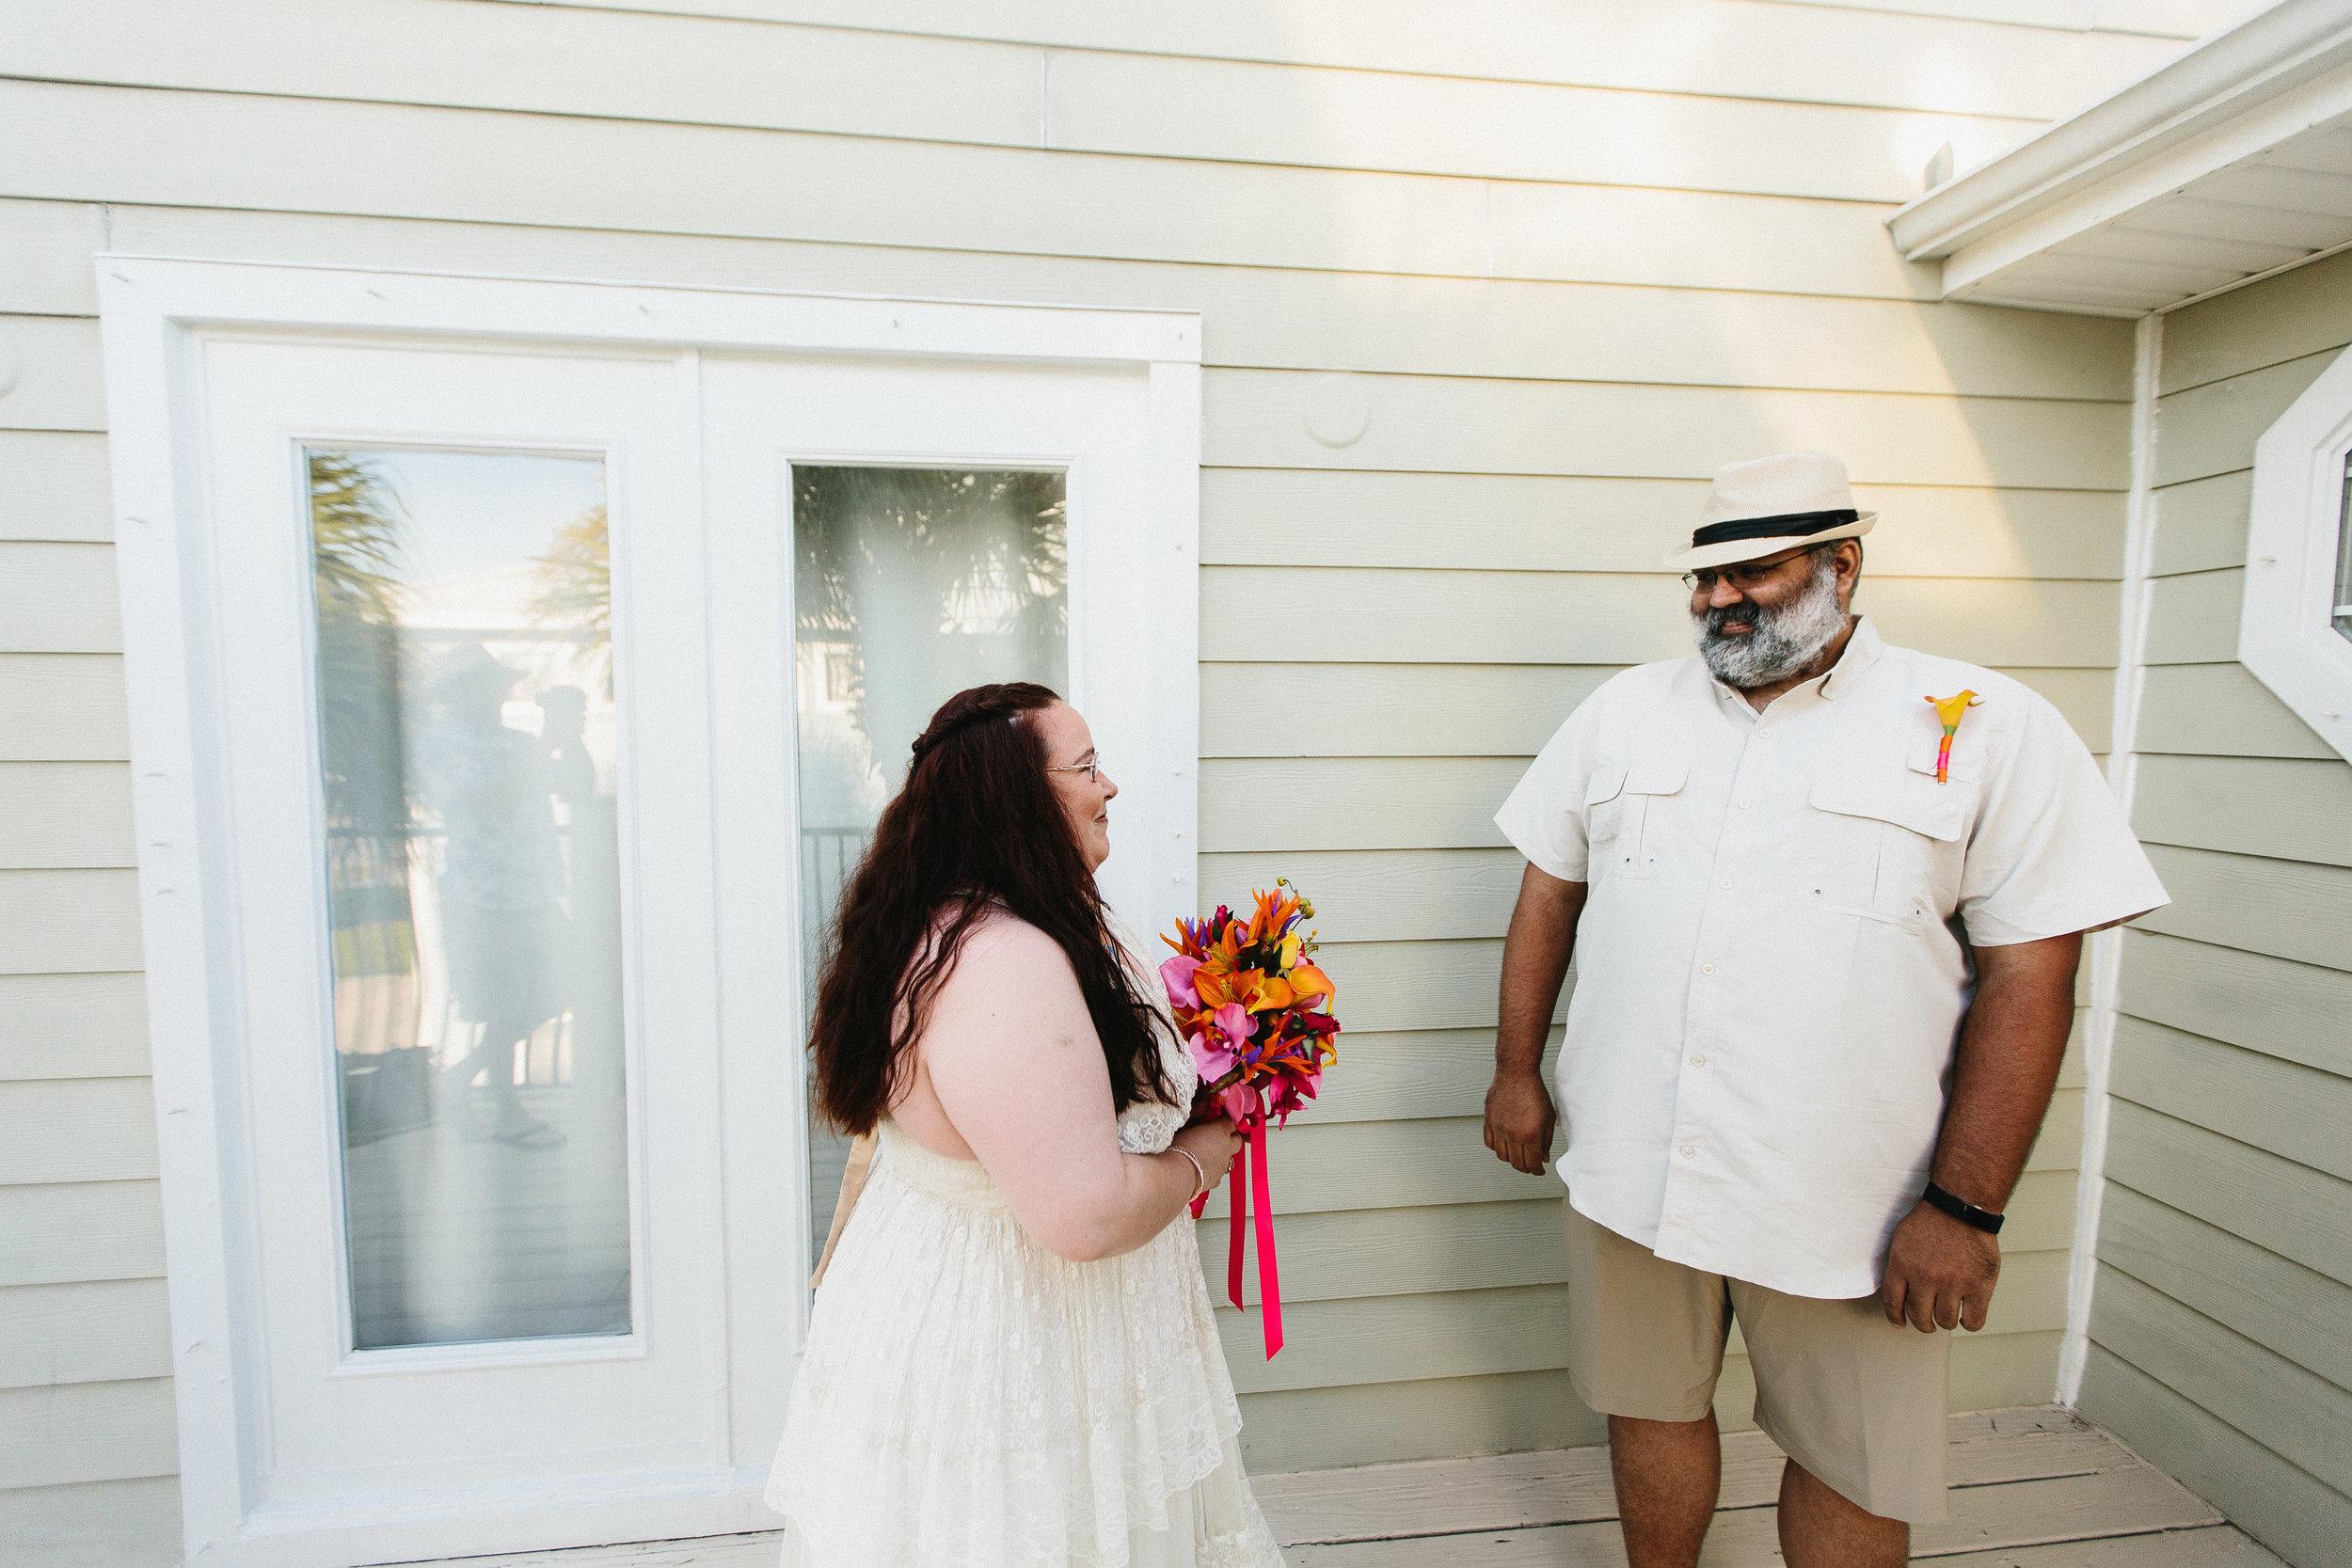 destin_sunset_beach_elopement_intimate_wedding_photographer_florida_documentary_1054.jpg